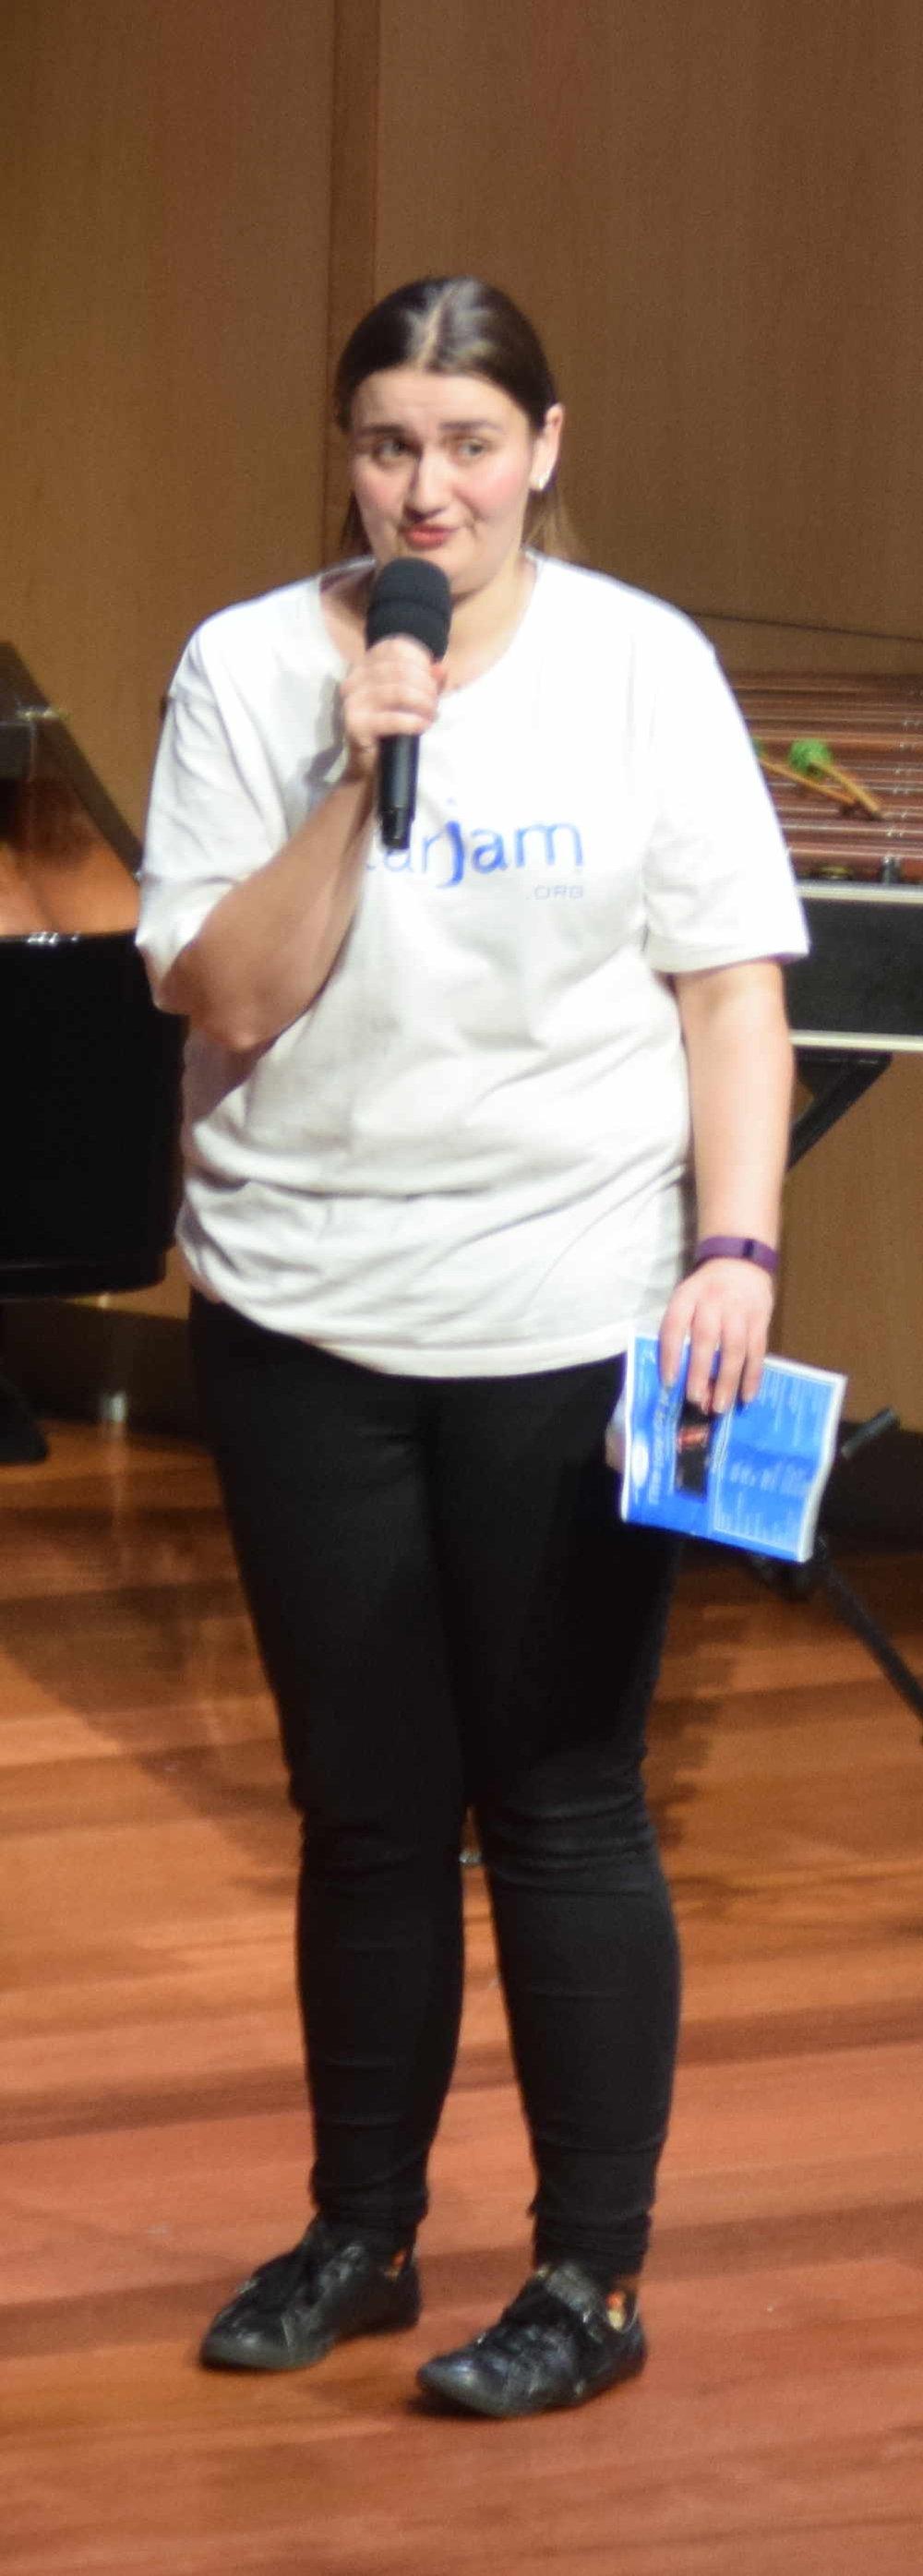 Jo Casey, StarJam Christchurch Regional Programmes Coordinator